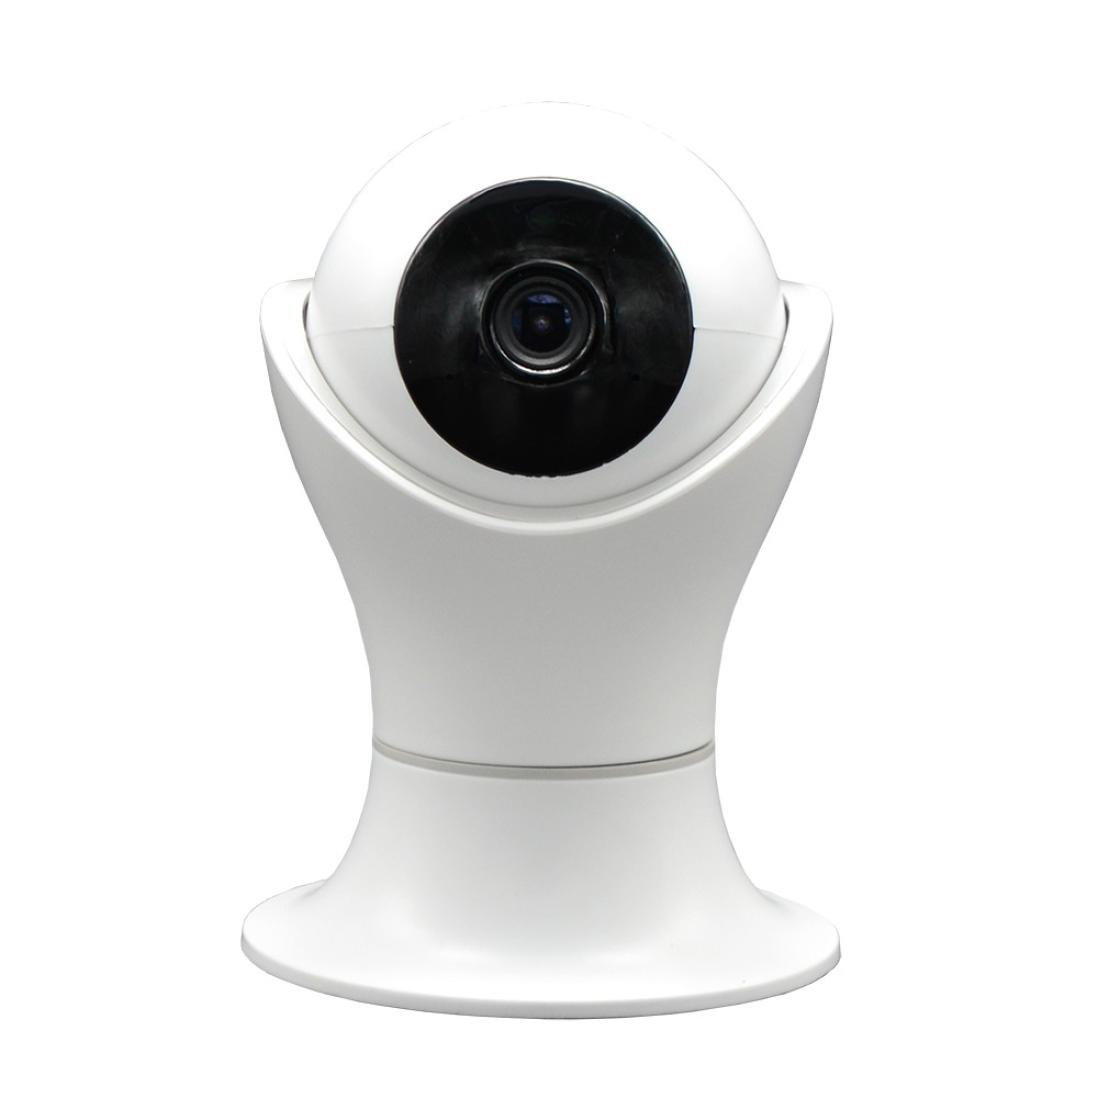 H+K+L Smart Camera Webcam HD 1080P WIFI Security IP Camera Wireless 2-Ways Audio CCTV Camera Baby Monitor (white)